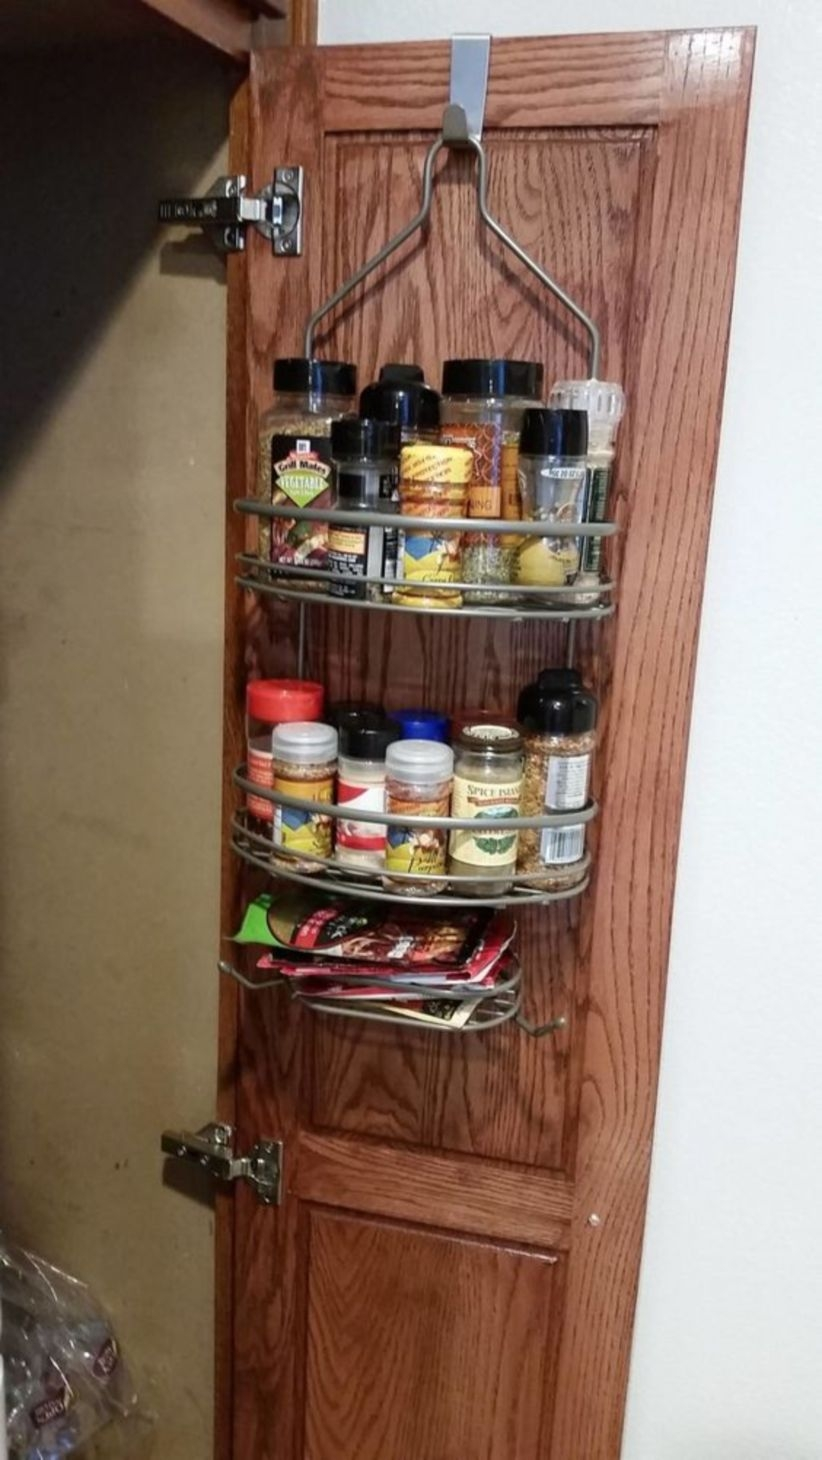 Diy rv camper remodel ideas for storage kichen